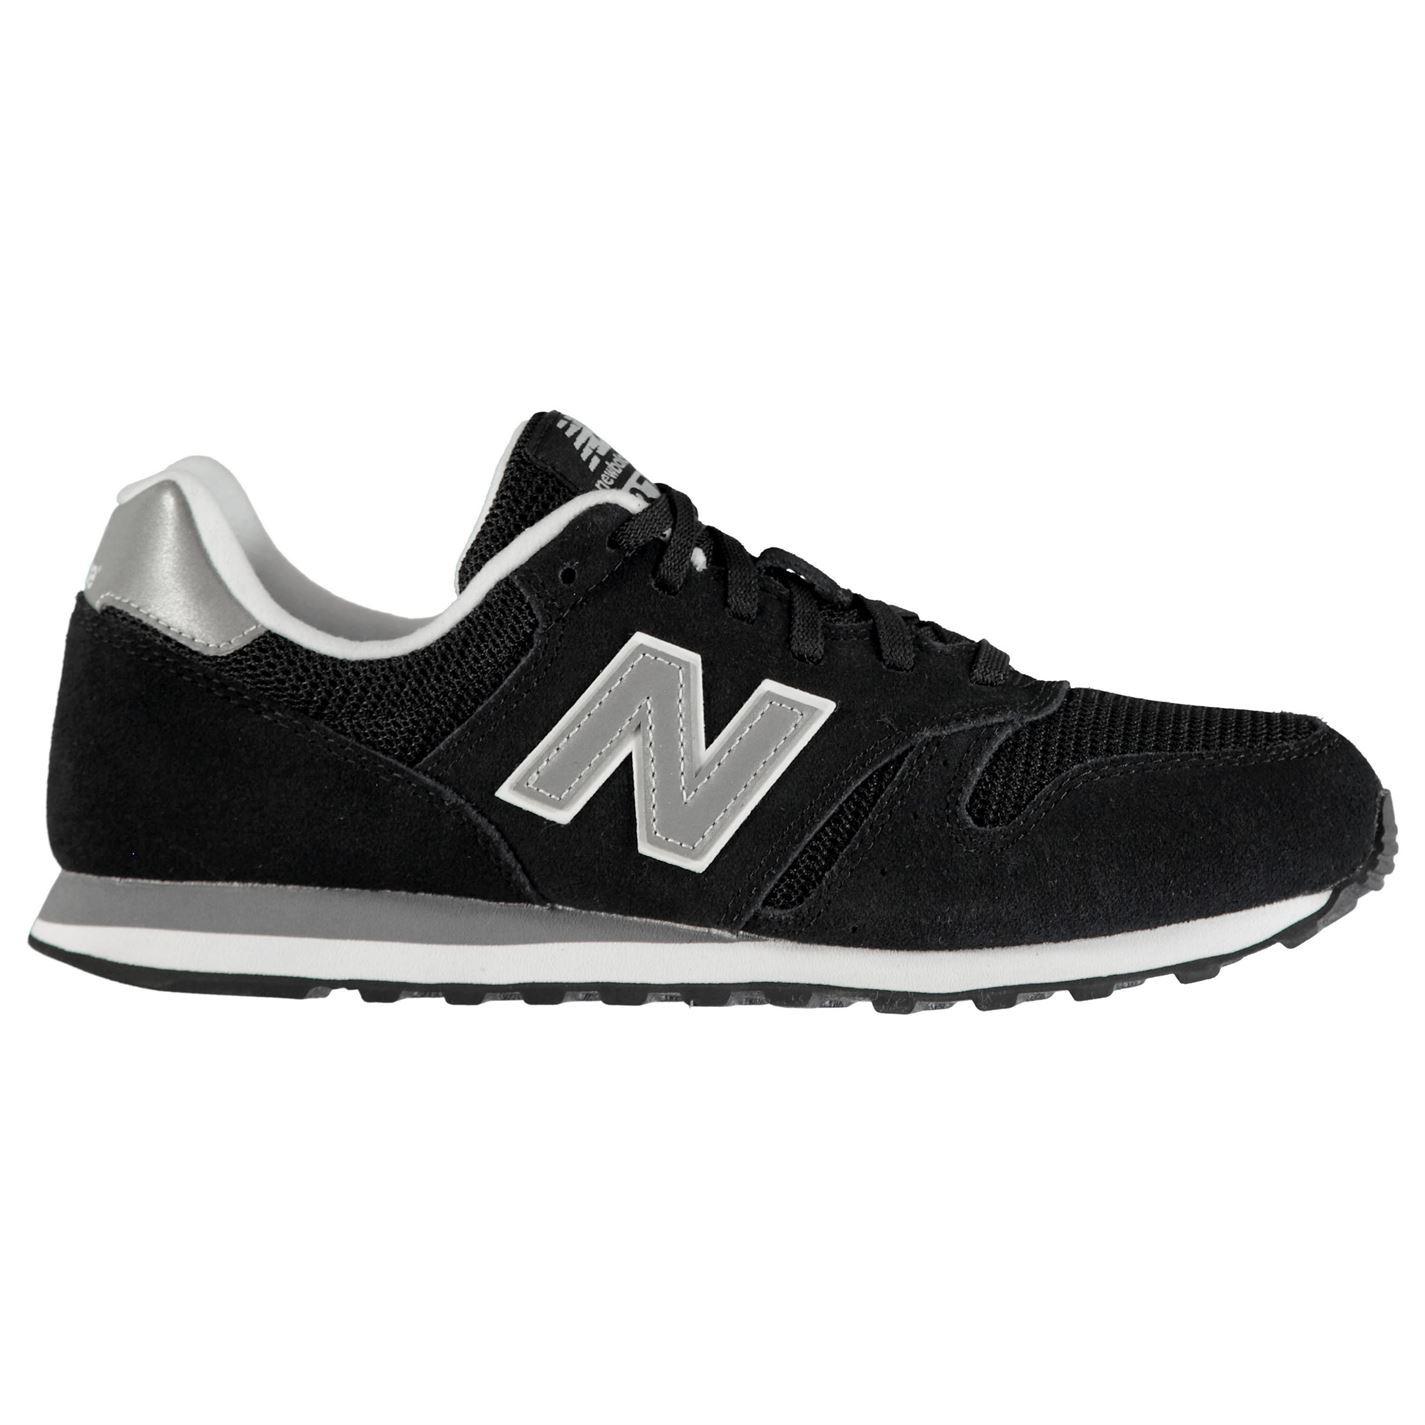 Para Hombre Bal 2018 NEW Nubuck corredores New Balance NEW 2018 daaf11